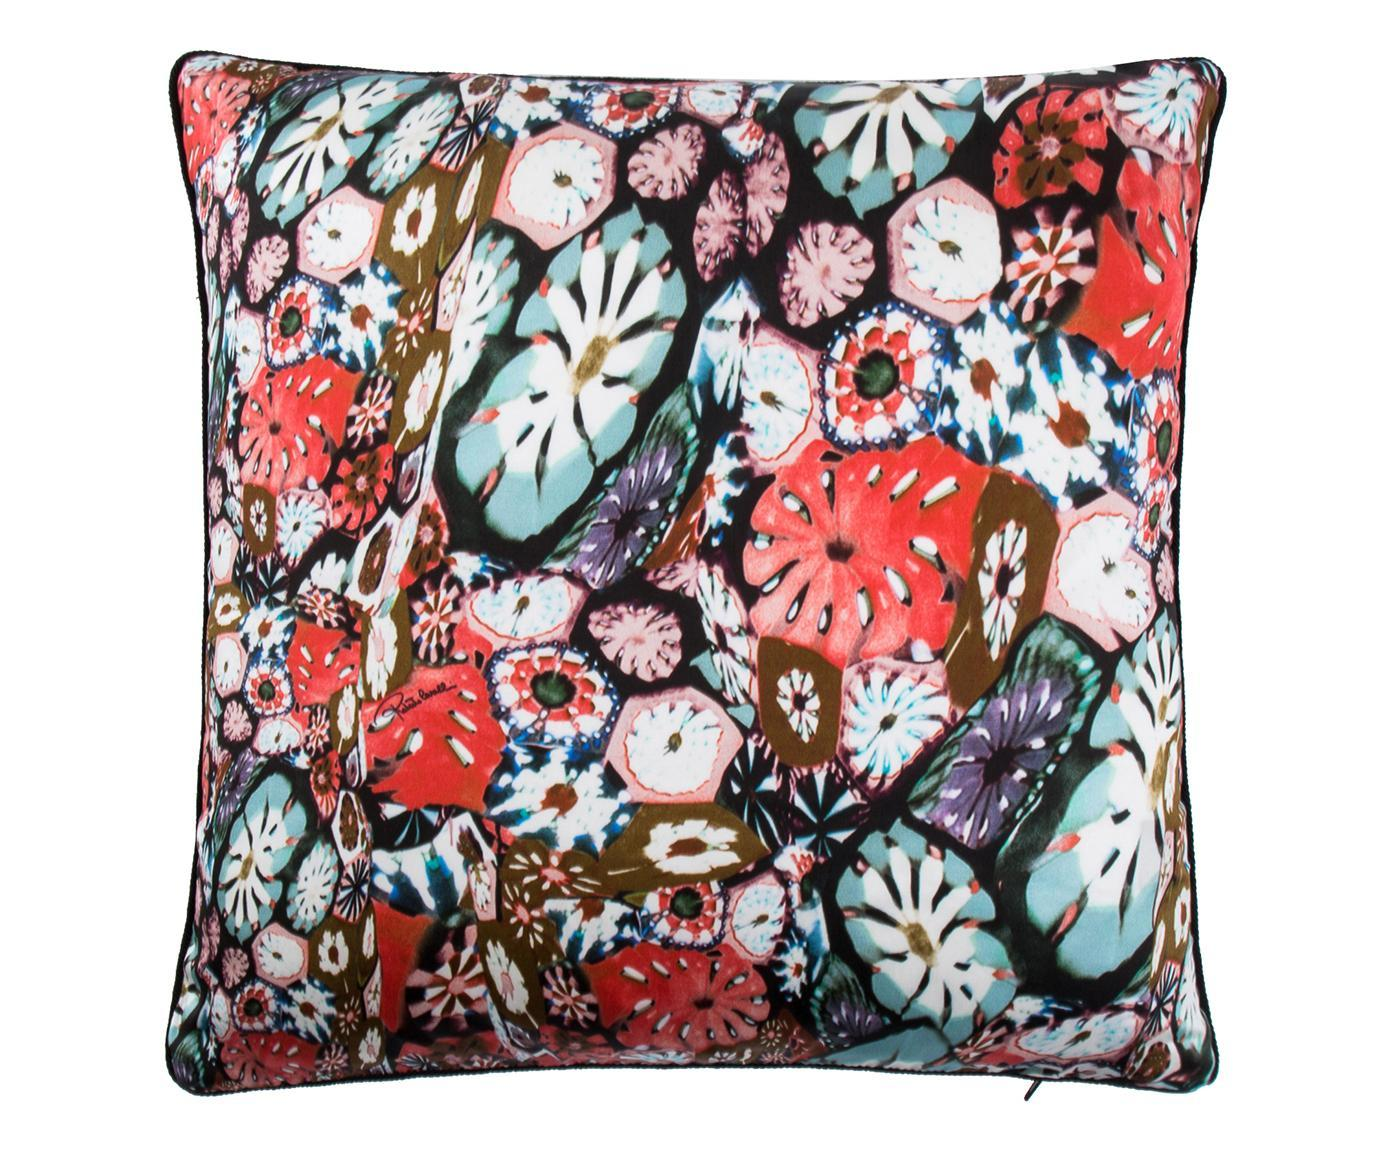 Cuscino arredo Murrine rosso, 40x40 cm